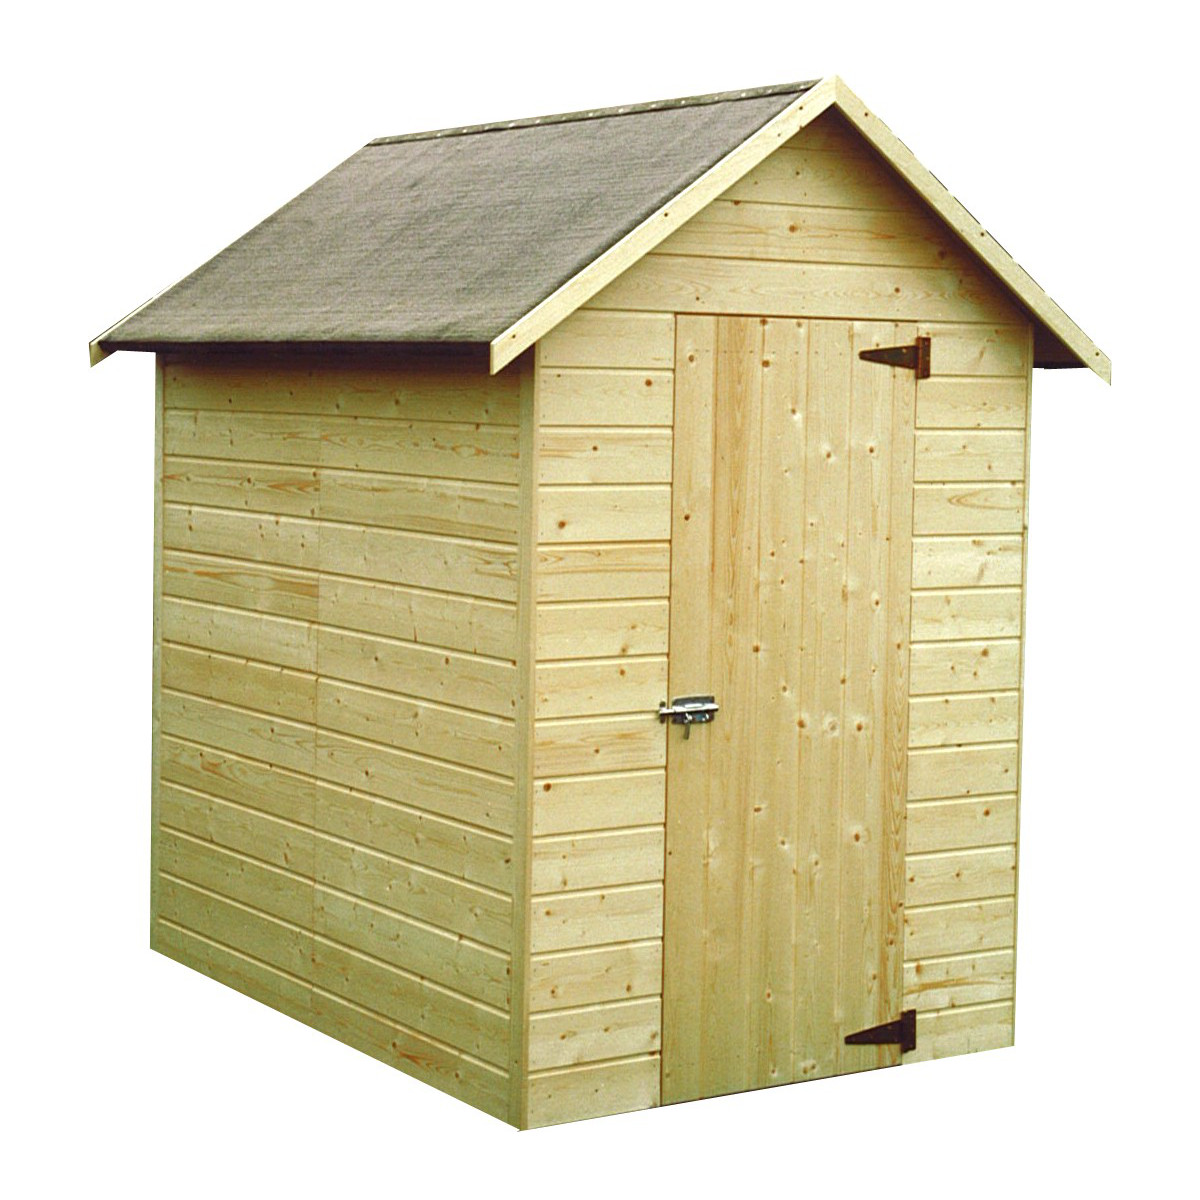 Petite cabane de jardin en bois pas cher - Casetas jardin ocasion ...